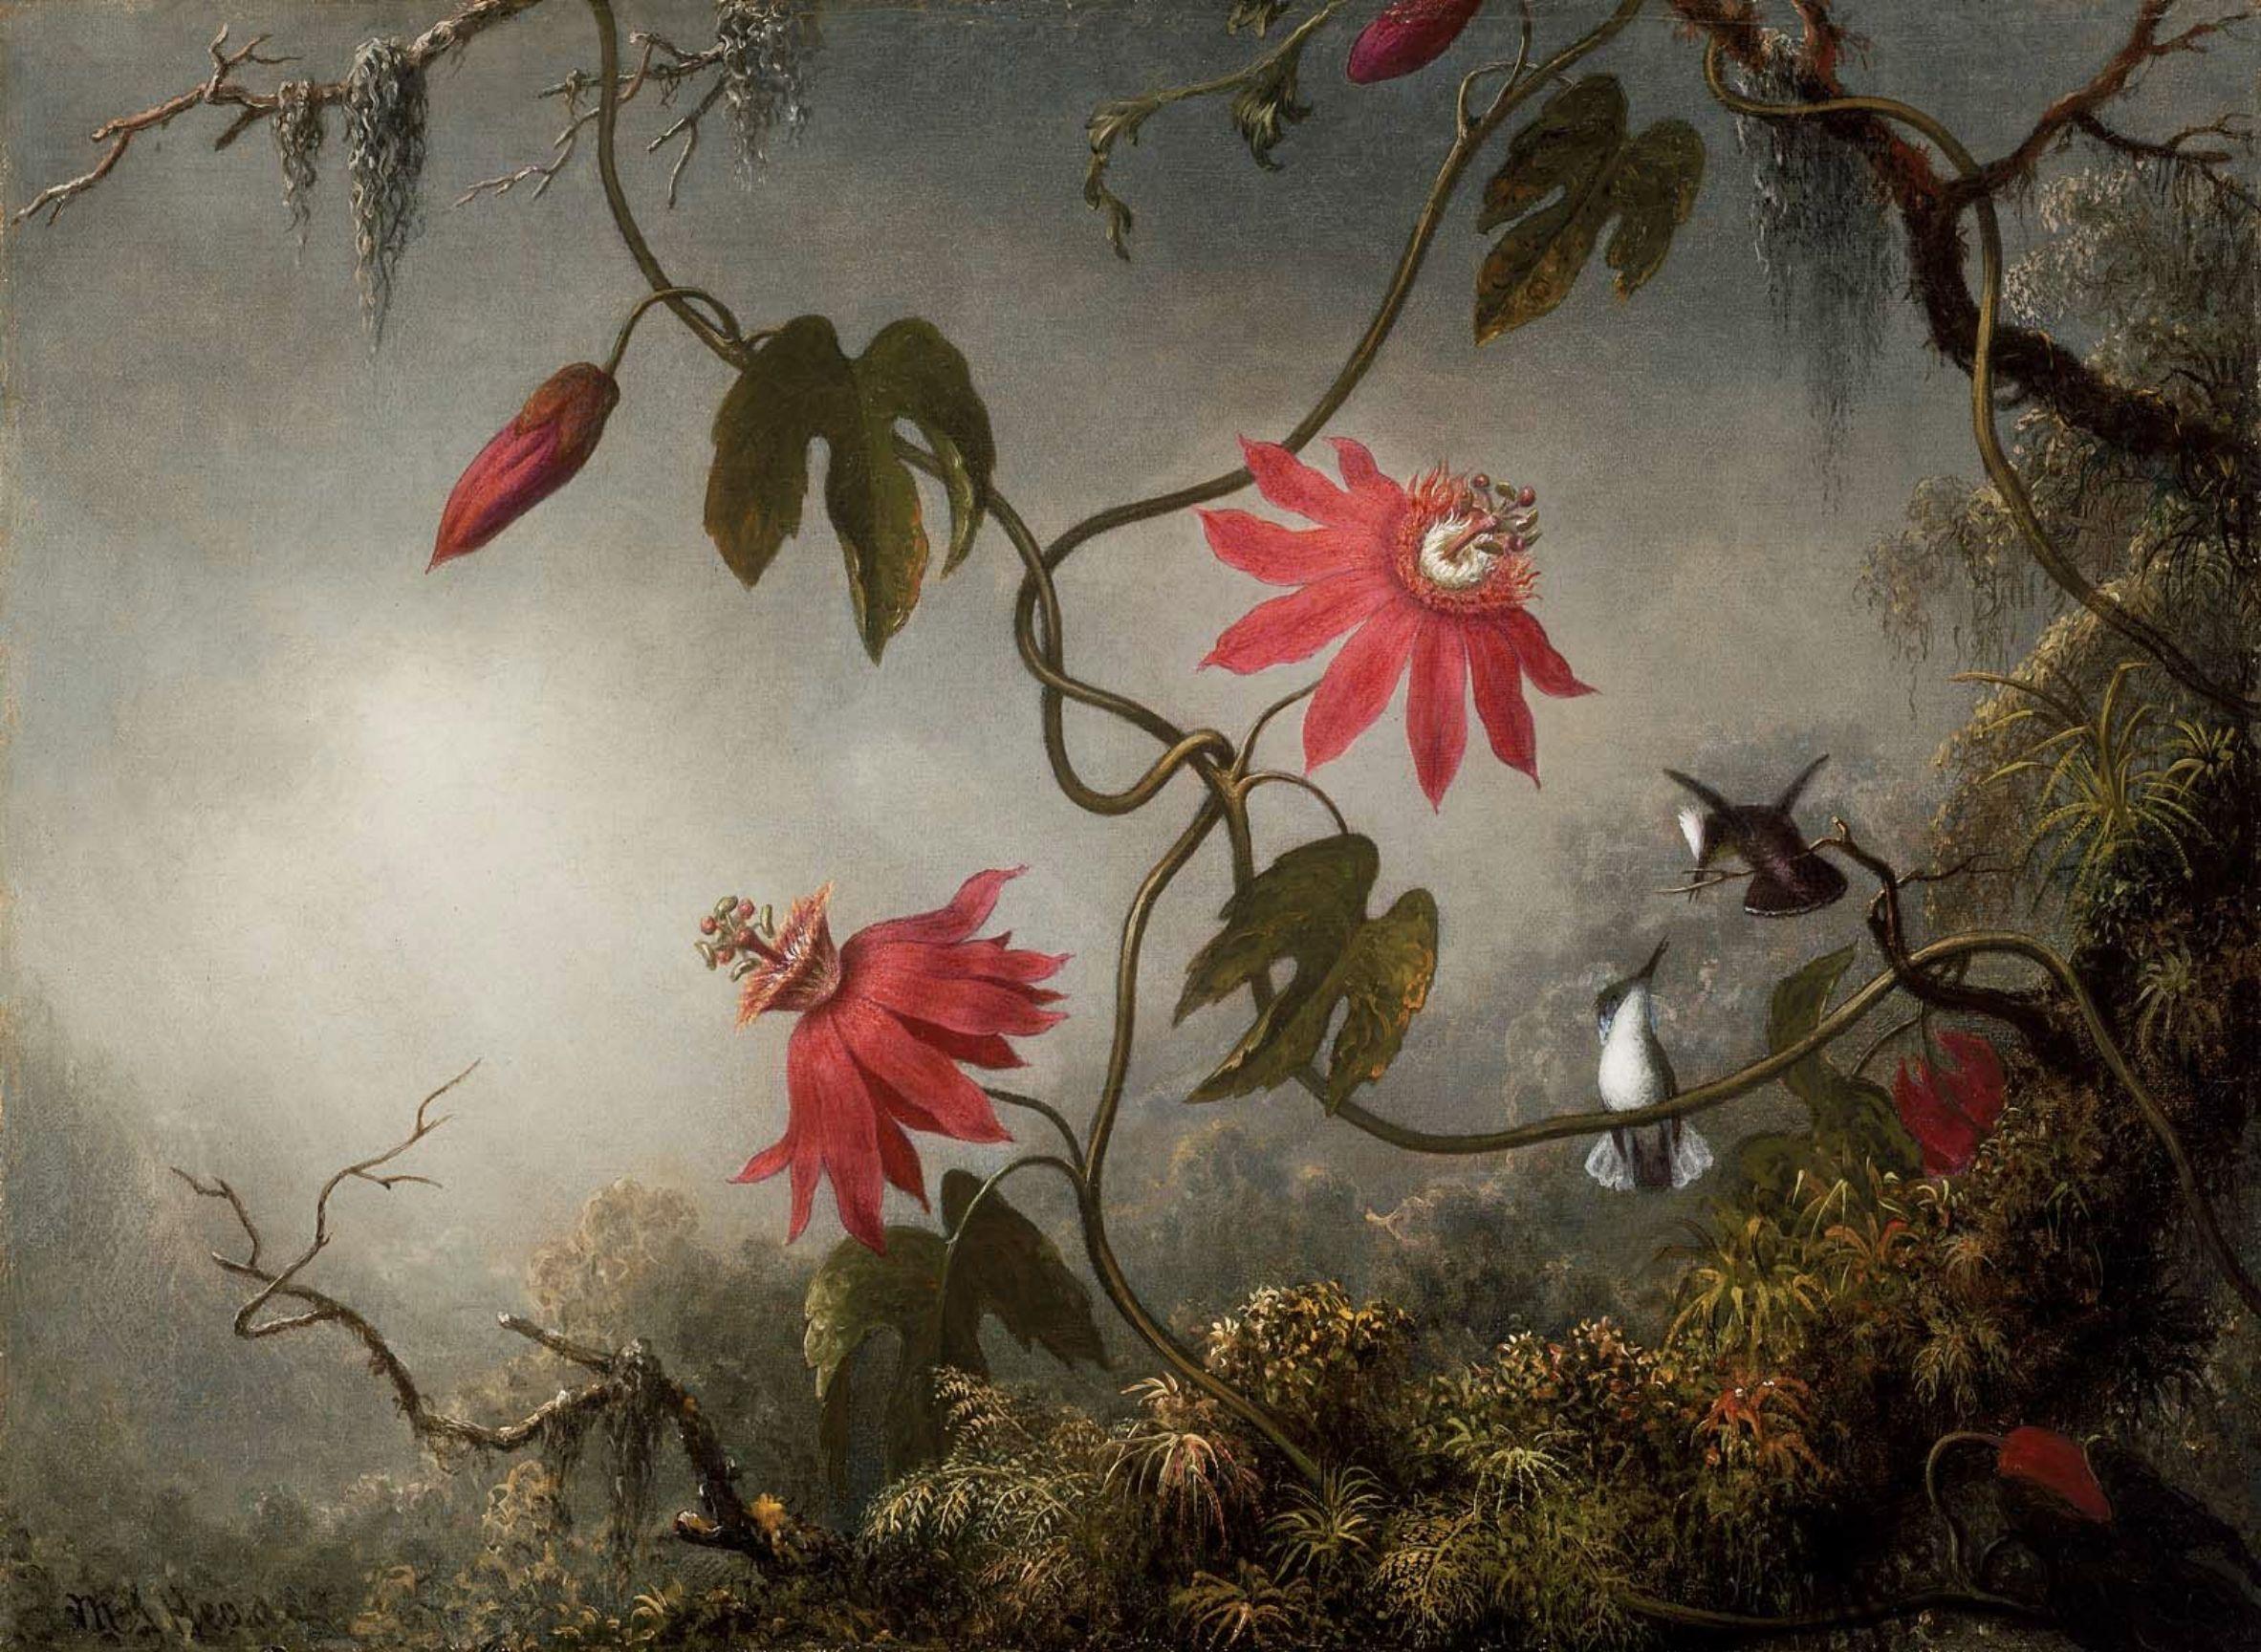 MJ_Heade_Passion_Flowers_and_Hummingbirds